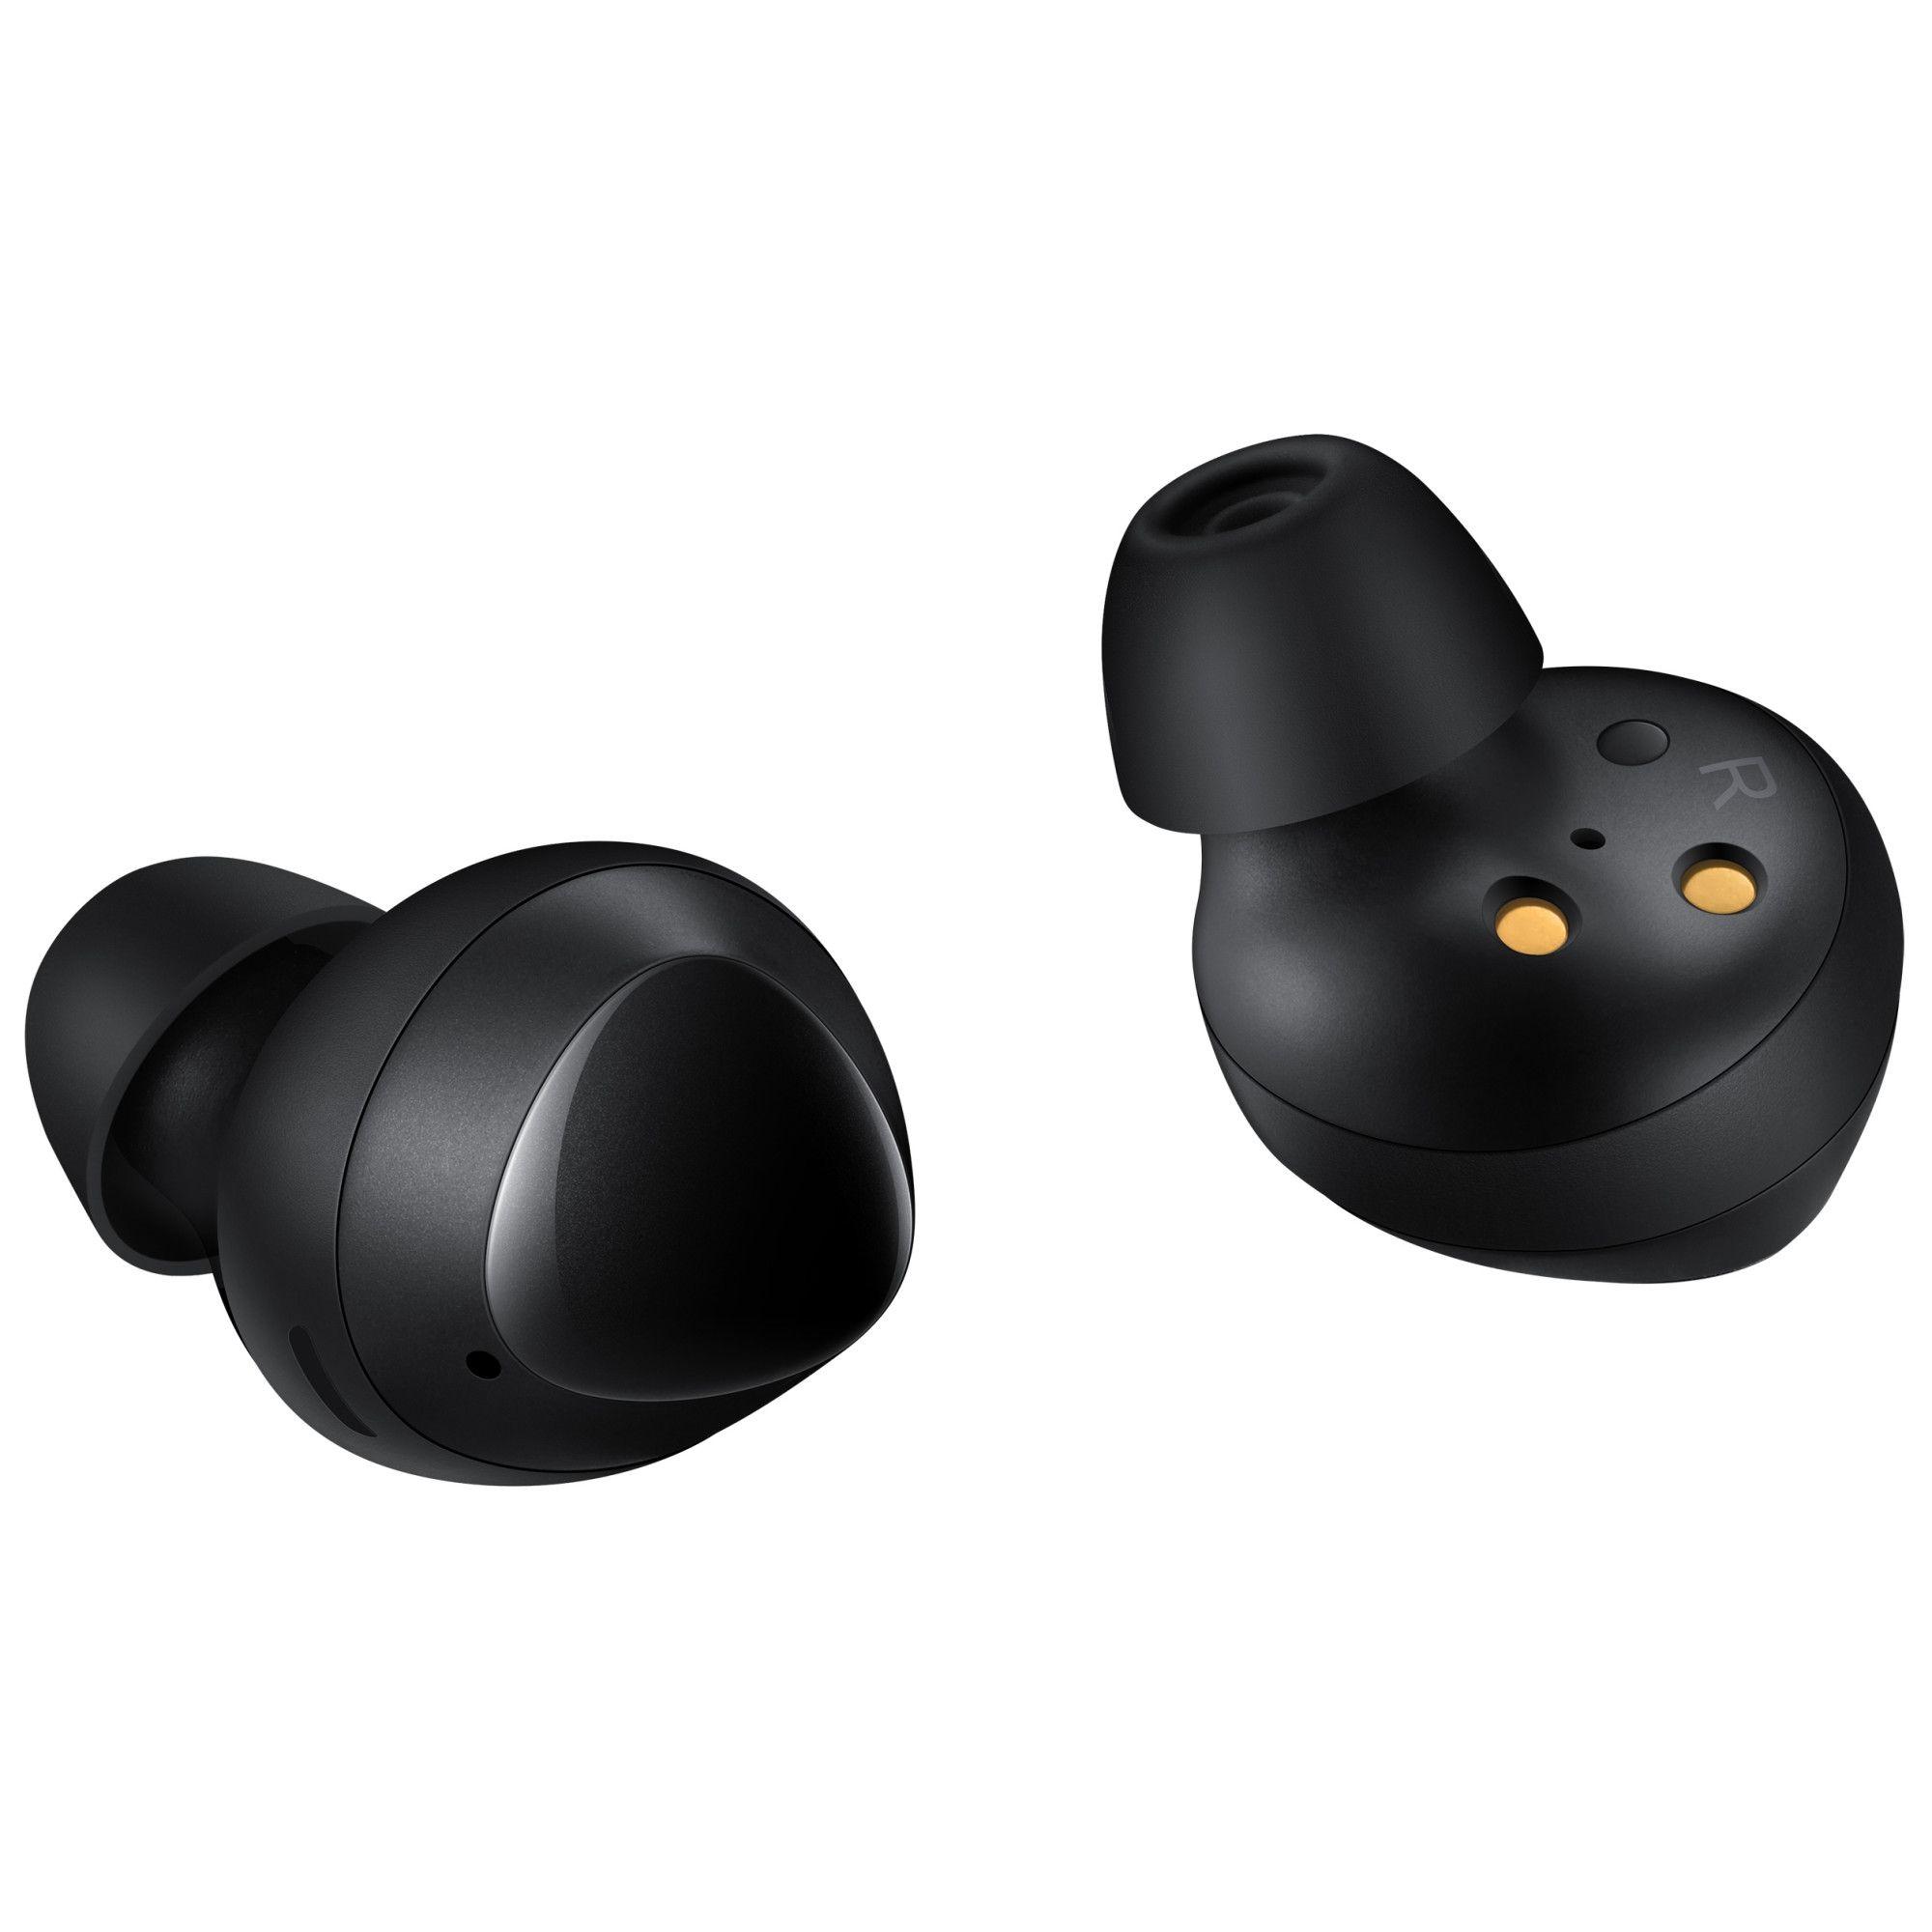 Casti stereo Samsung Galaxy Buds In-Ear Black